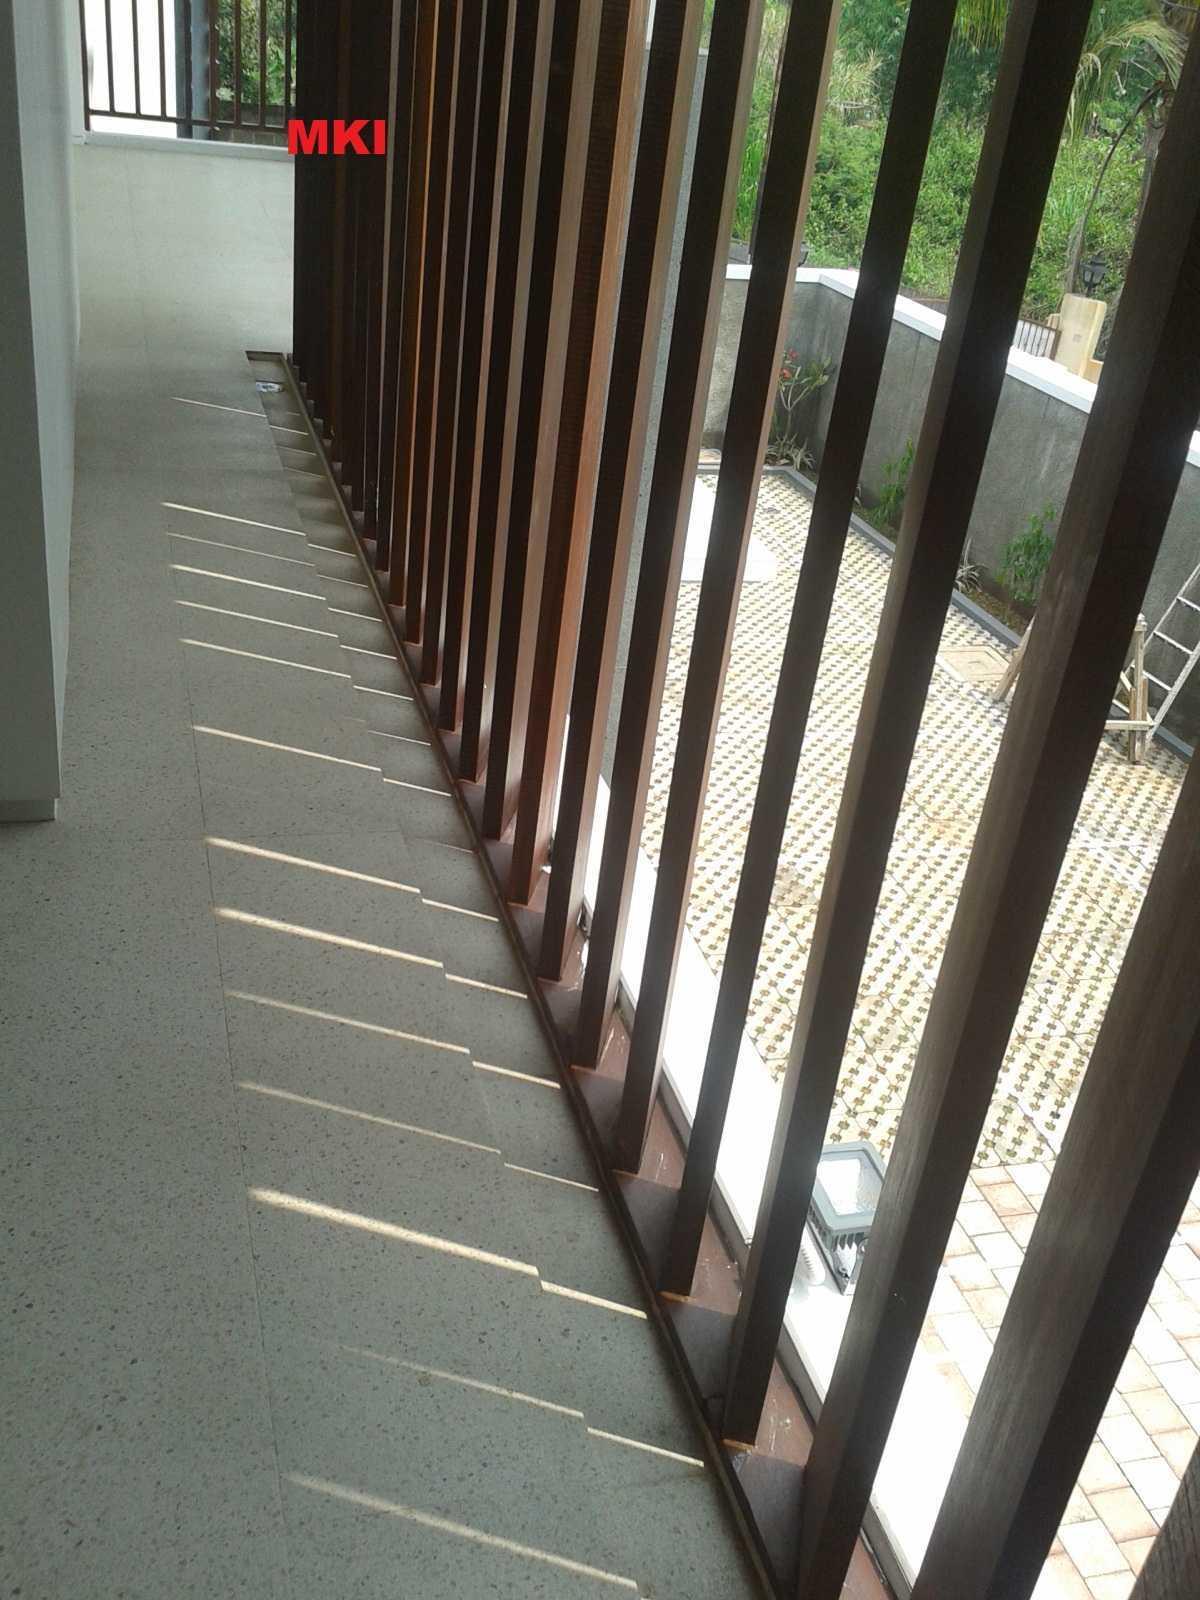 Mki Ts House Cibinong, Bogor, West Java, Indonesia Bogor The Reflection Of Light Behind A Wooden Lattice On The Balcony   16873